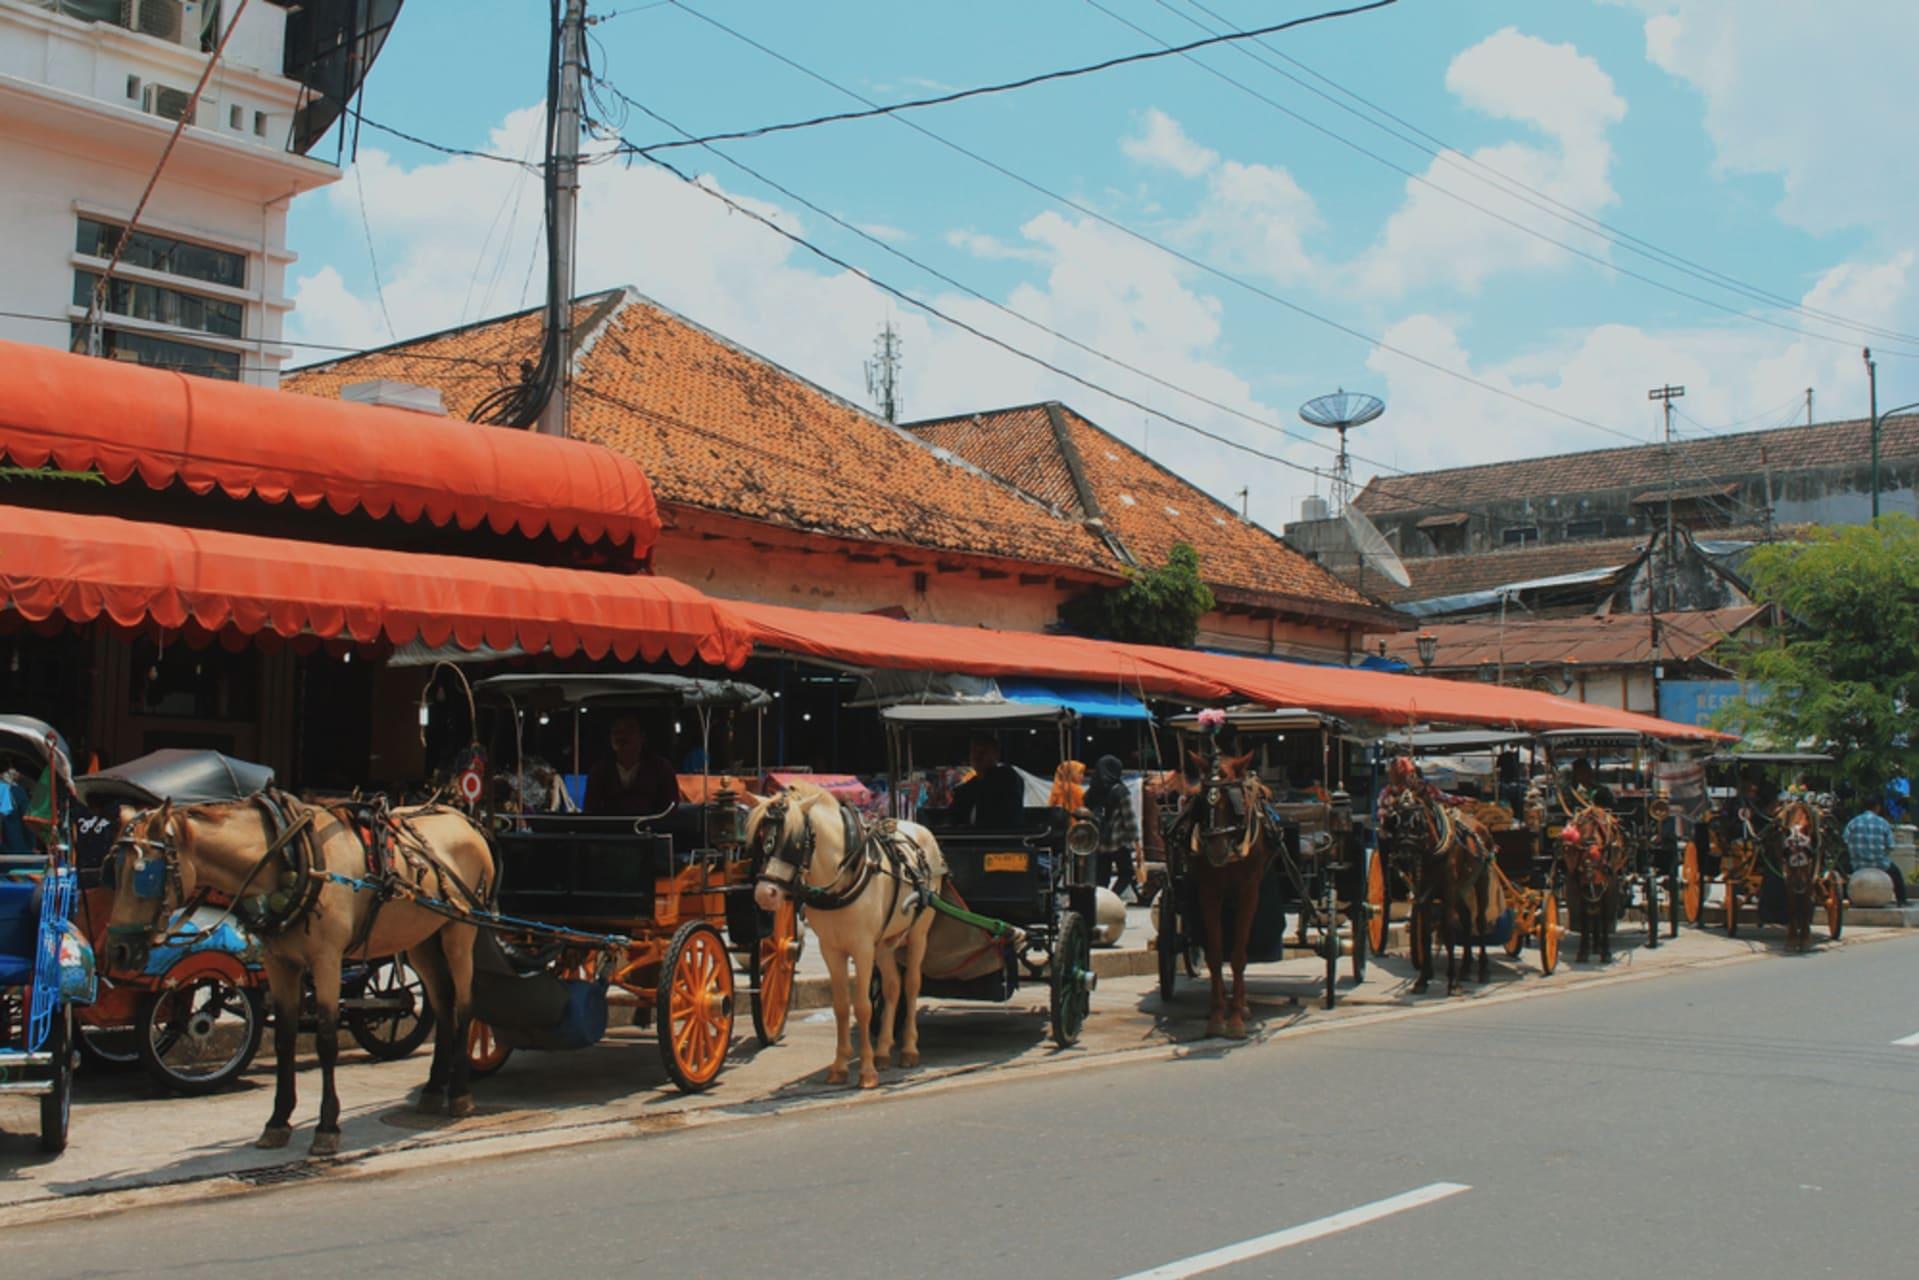 Yogyakarta - Explore the Central Market of Malioboro Street